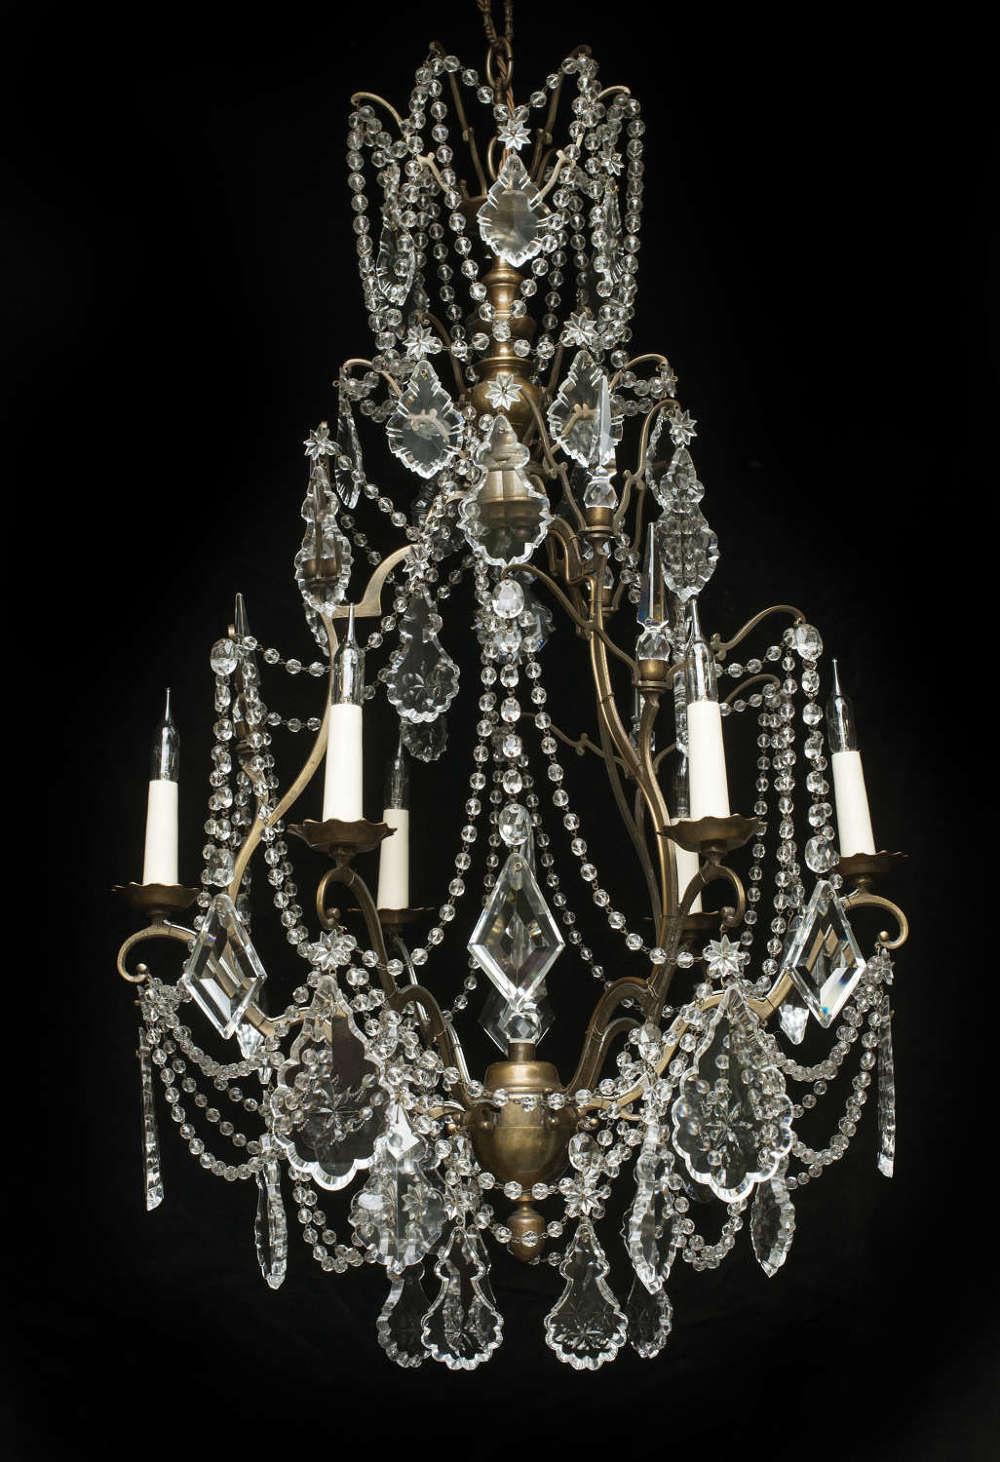 Vintage Chandelier Crystal Beaded Drape 1930's Antique